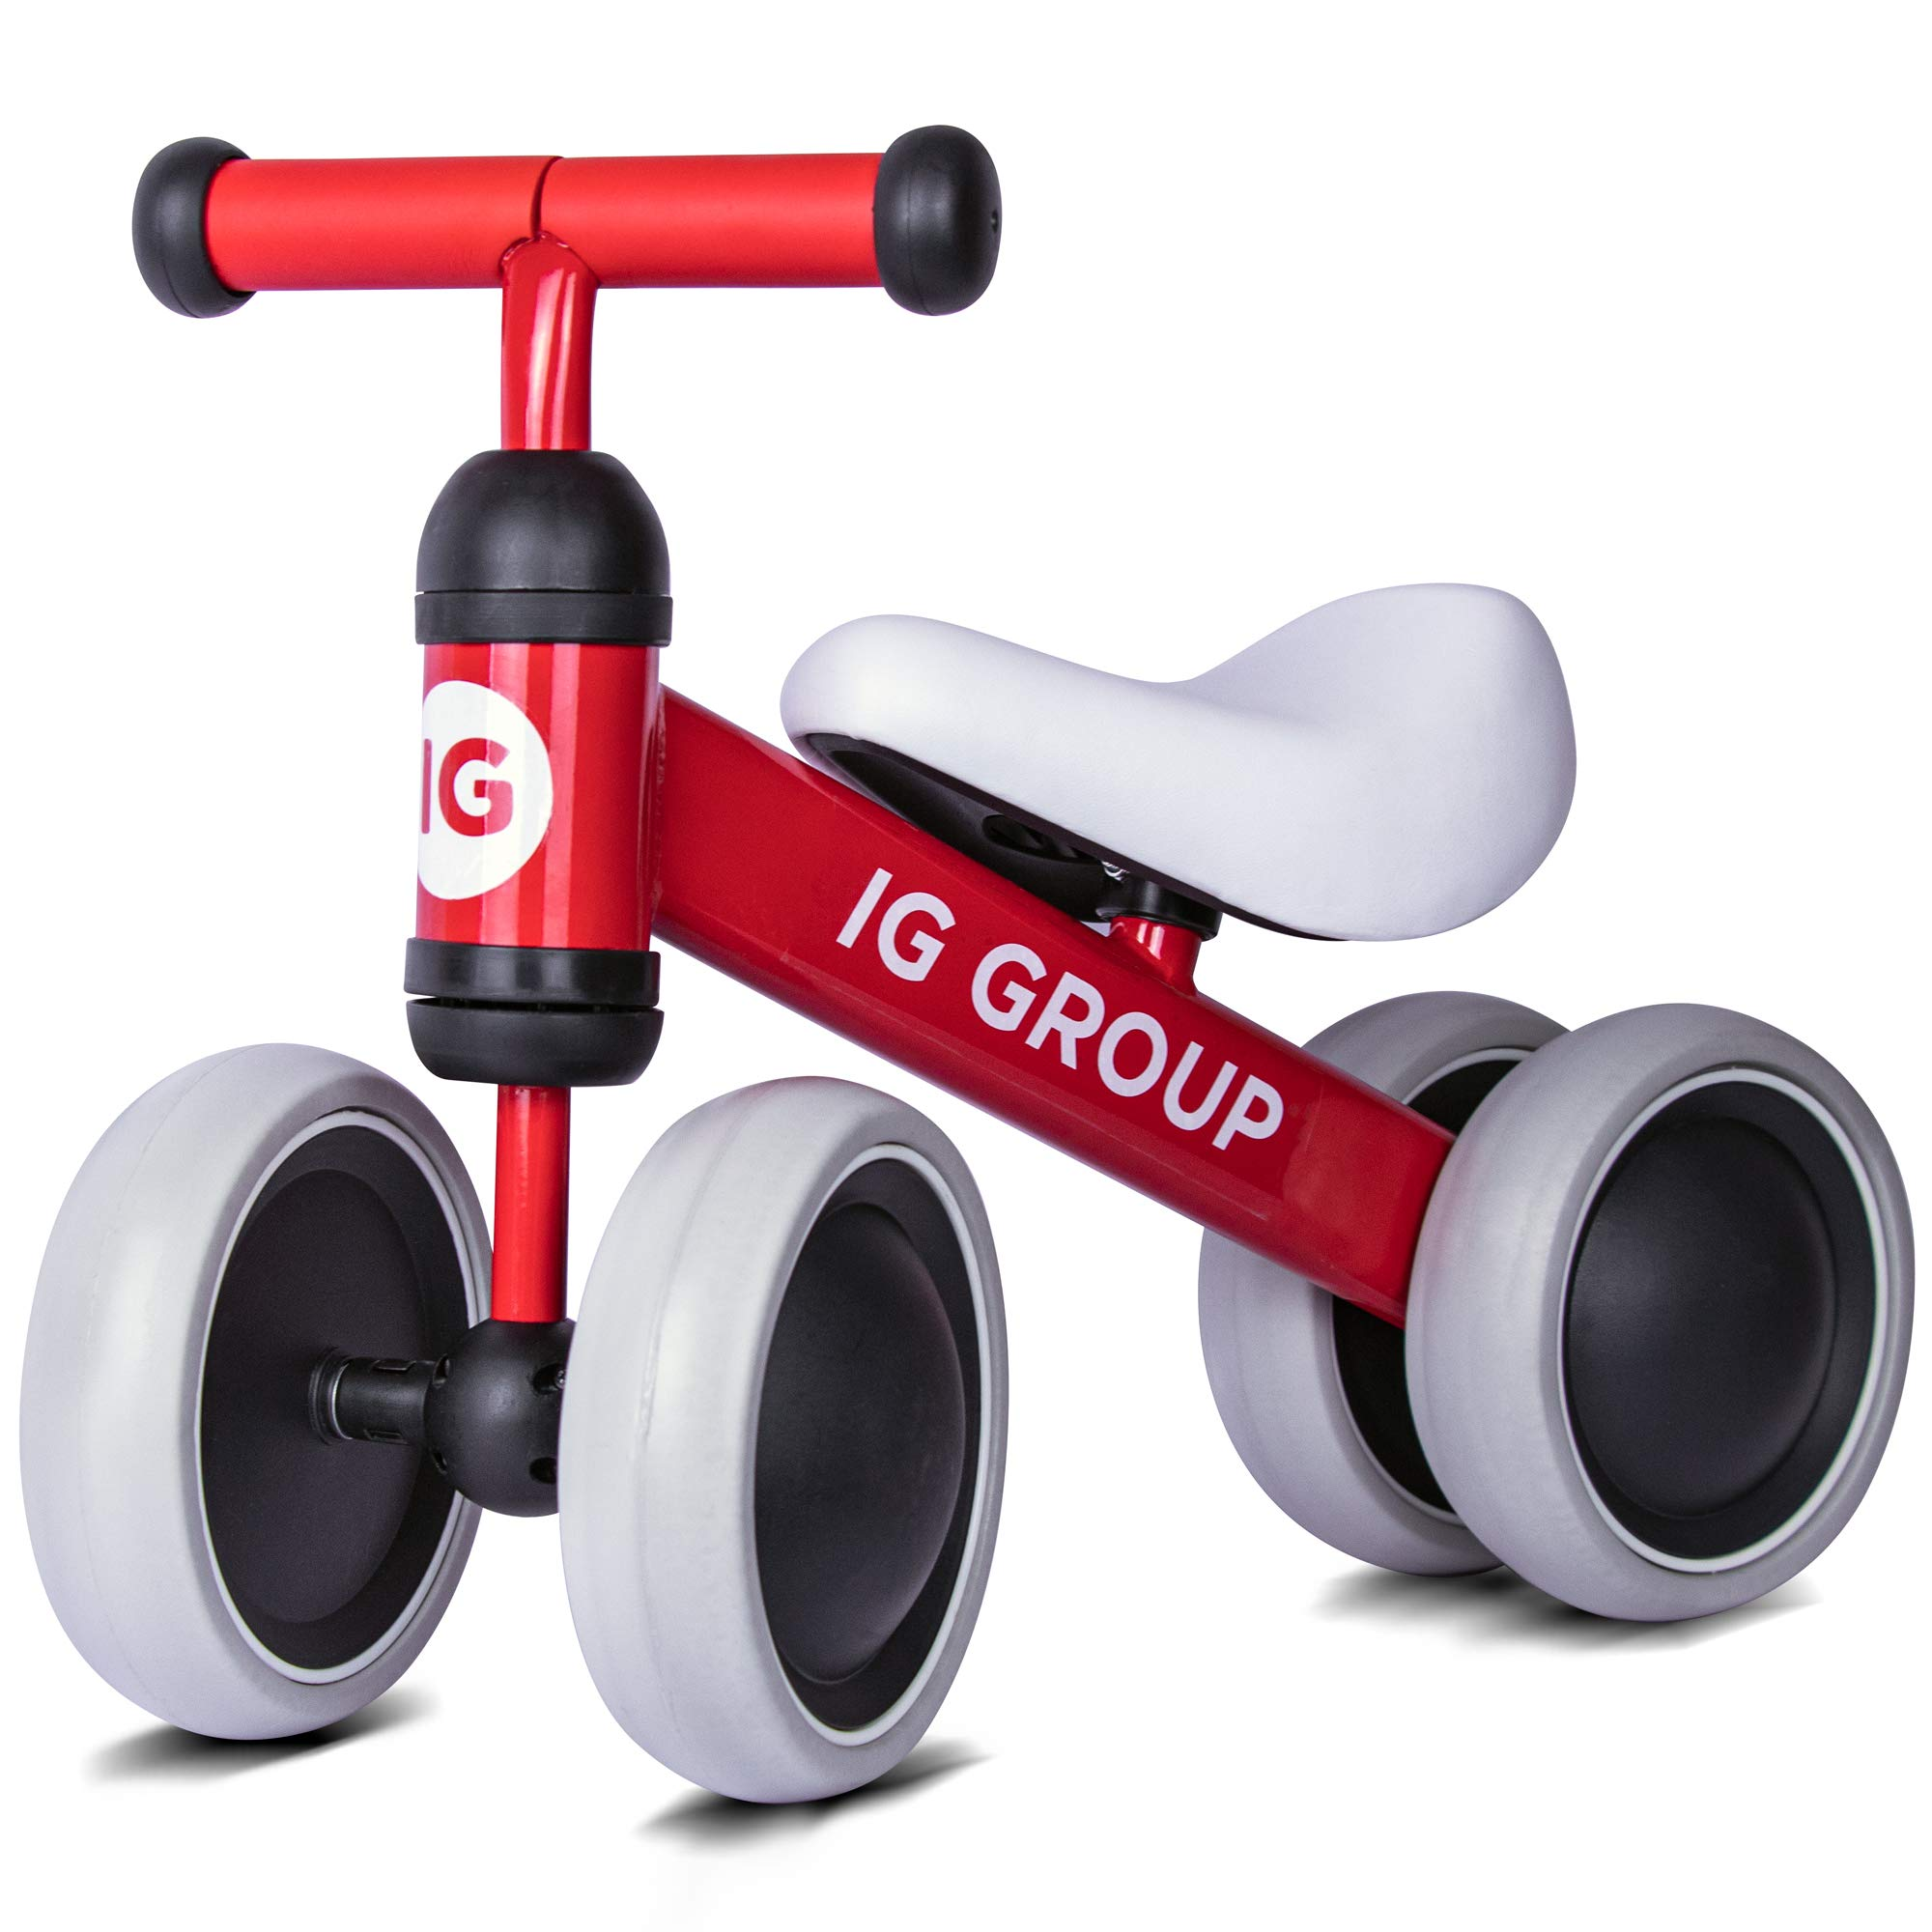 SANXIA Baby Balance Bike,Toddler Bicycle Children Walker for 10-24 Months Baby